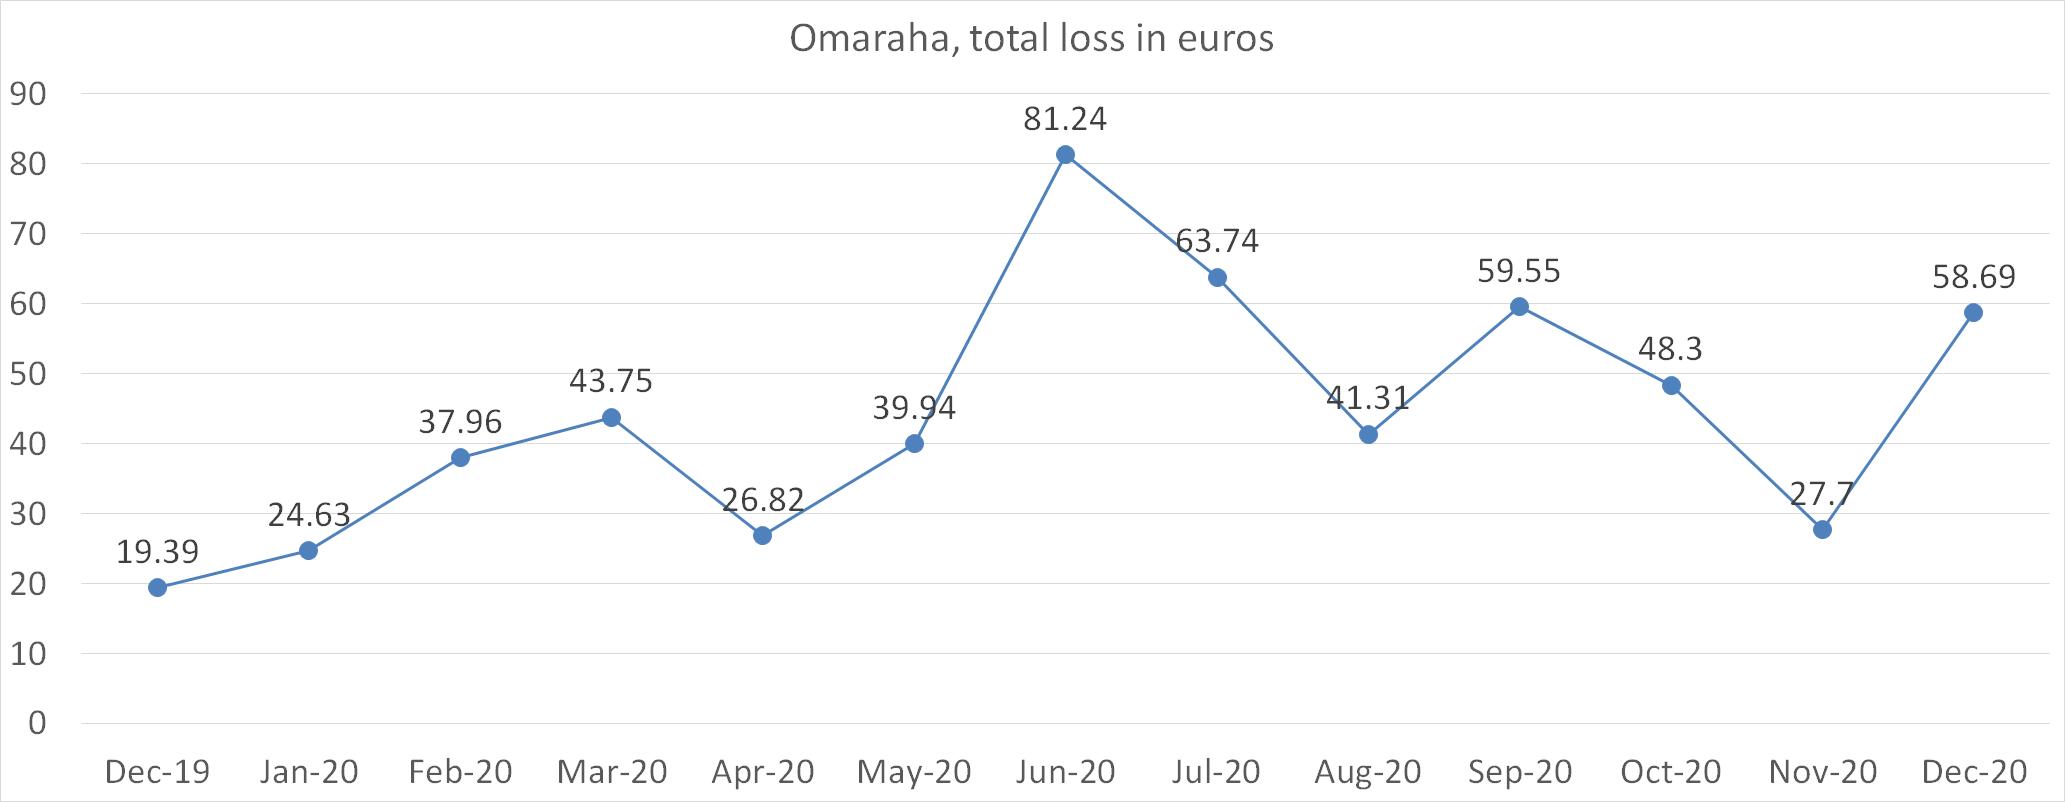 Omaraha total loss in euros december 2020